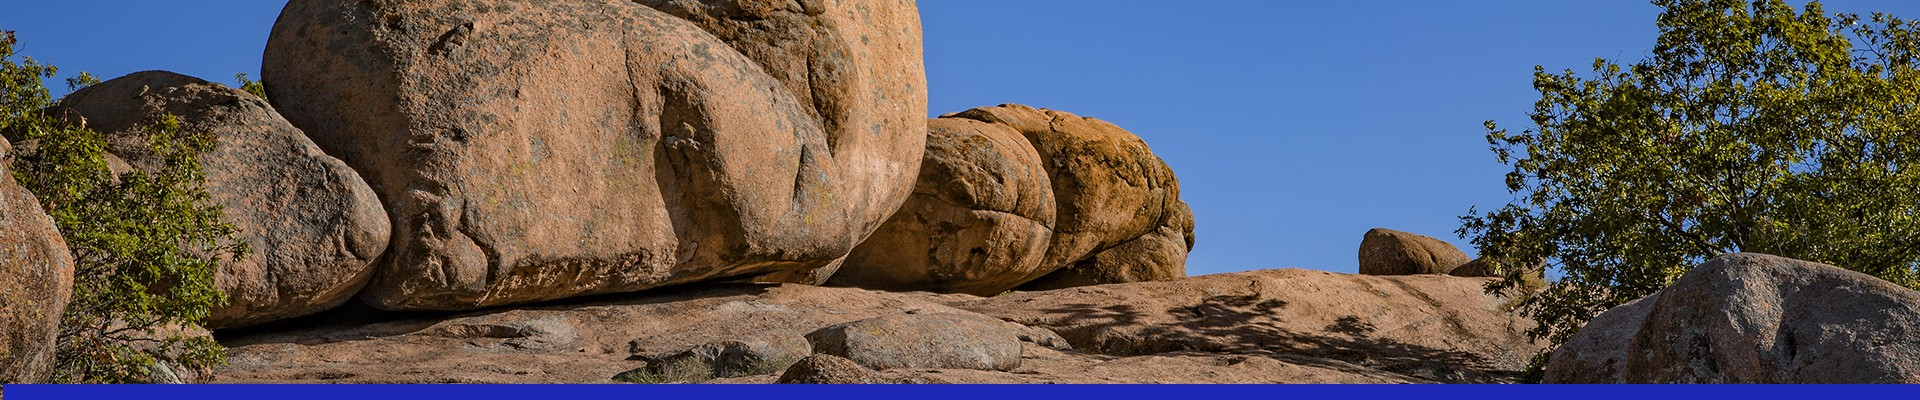 Tour the rocks at Elephant Rocks State Park.